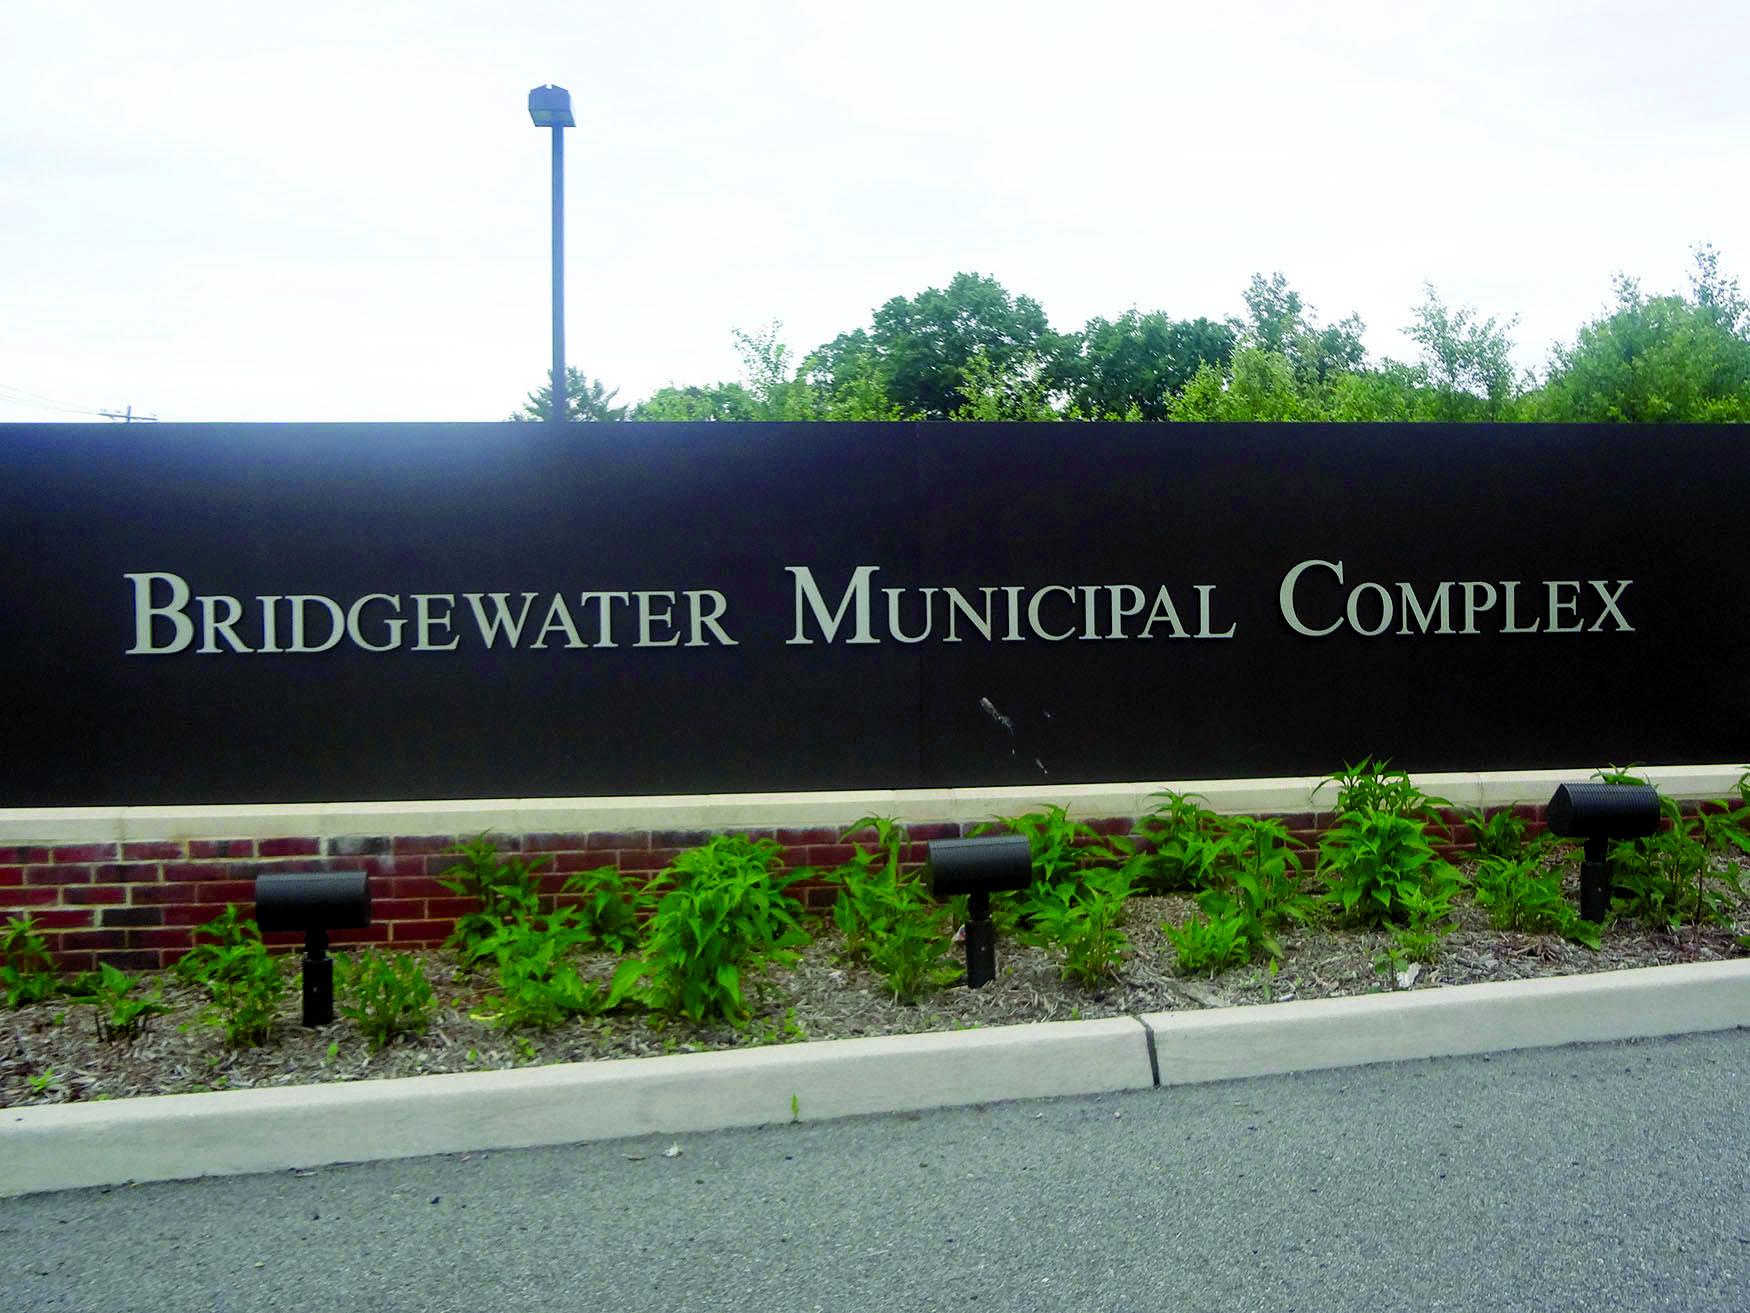 0ae34e1eeb5f9d987a64_Bridgewater_municipal.jpg